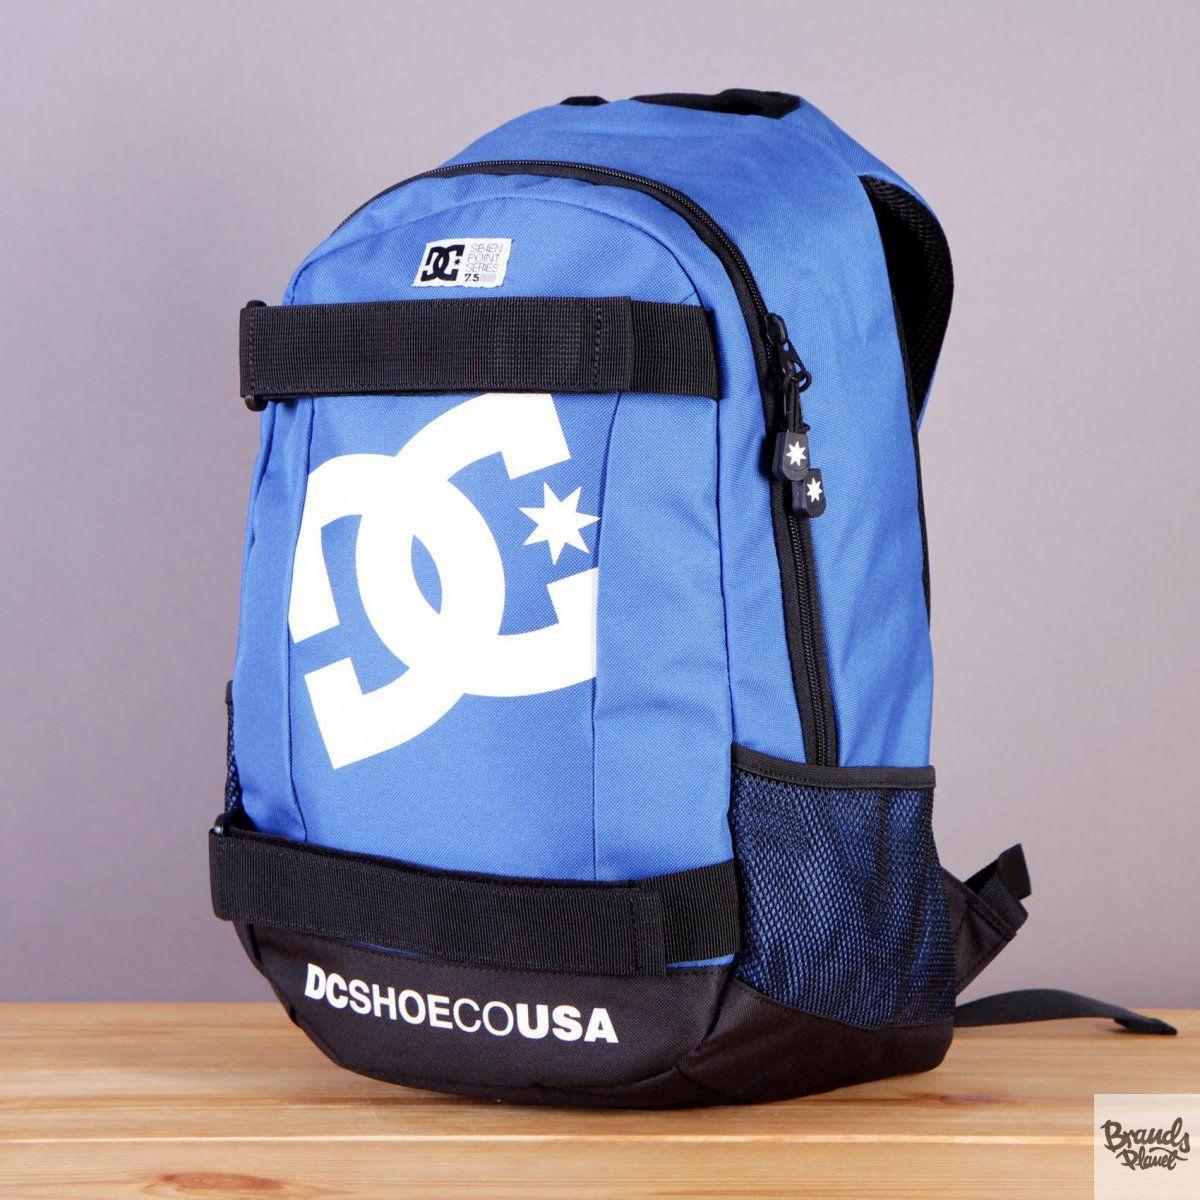 Brandsplanet Pl Bags Blue Backpacks